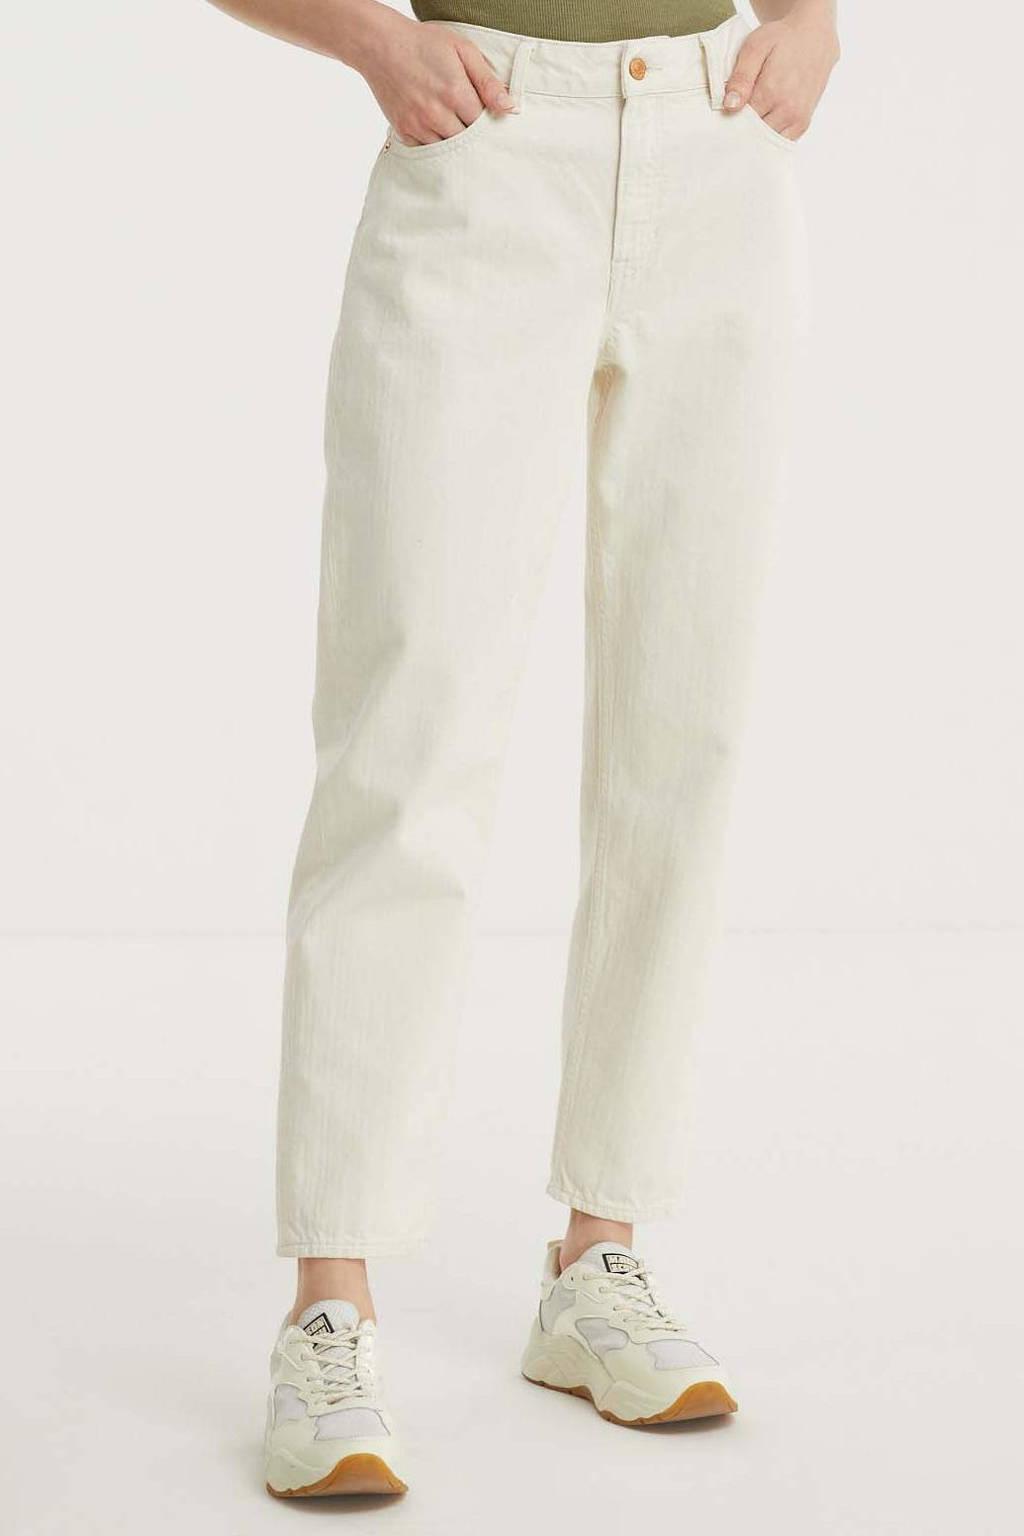 Kings of Indigo high waist straight fit jeans CAROLINE van biologisch katoen 7201 ecru, 7201 ECRU